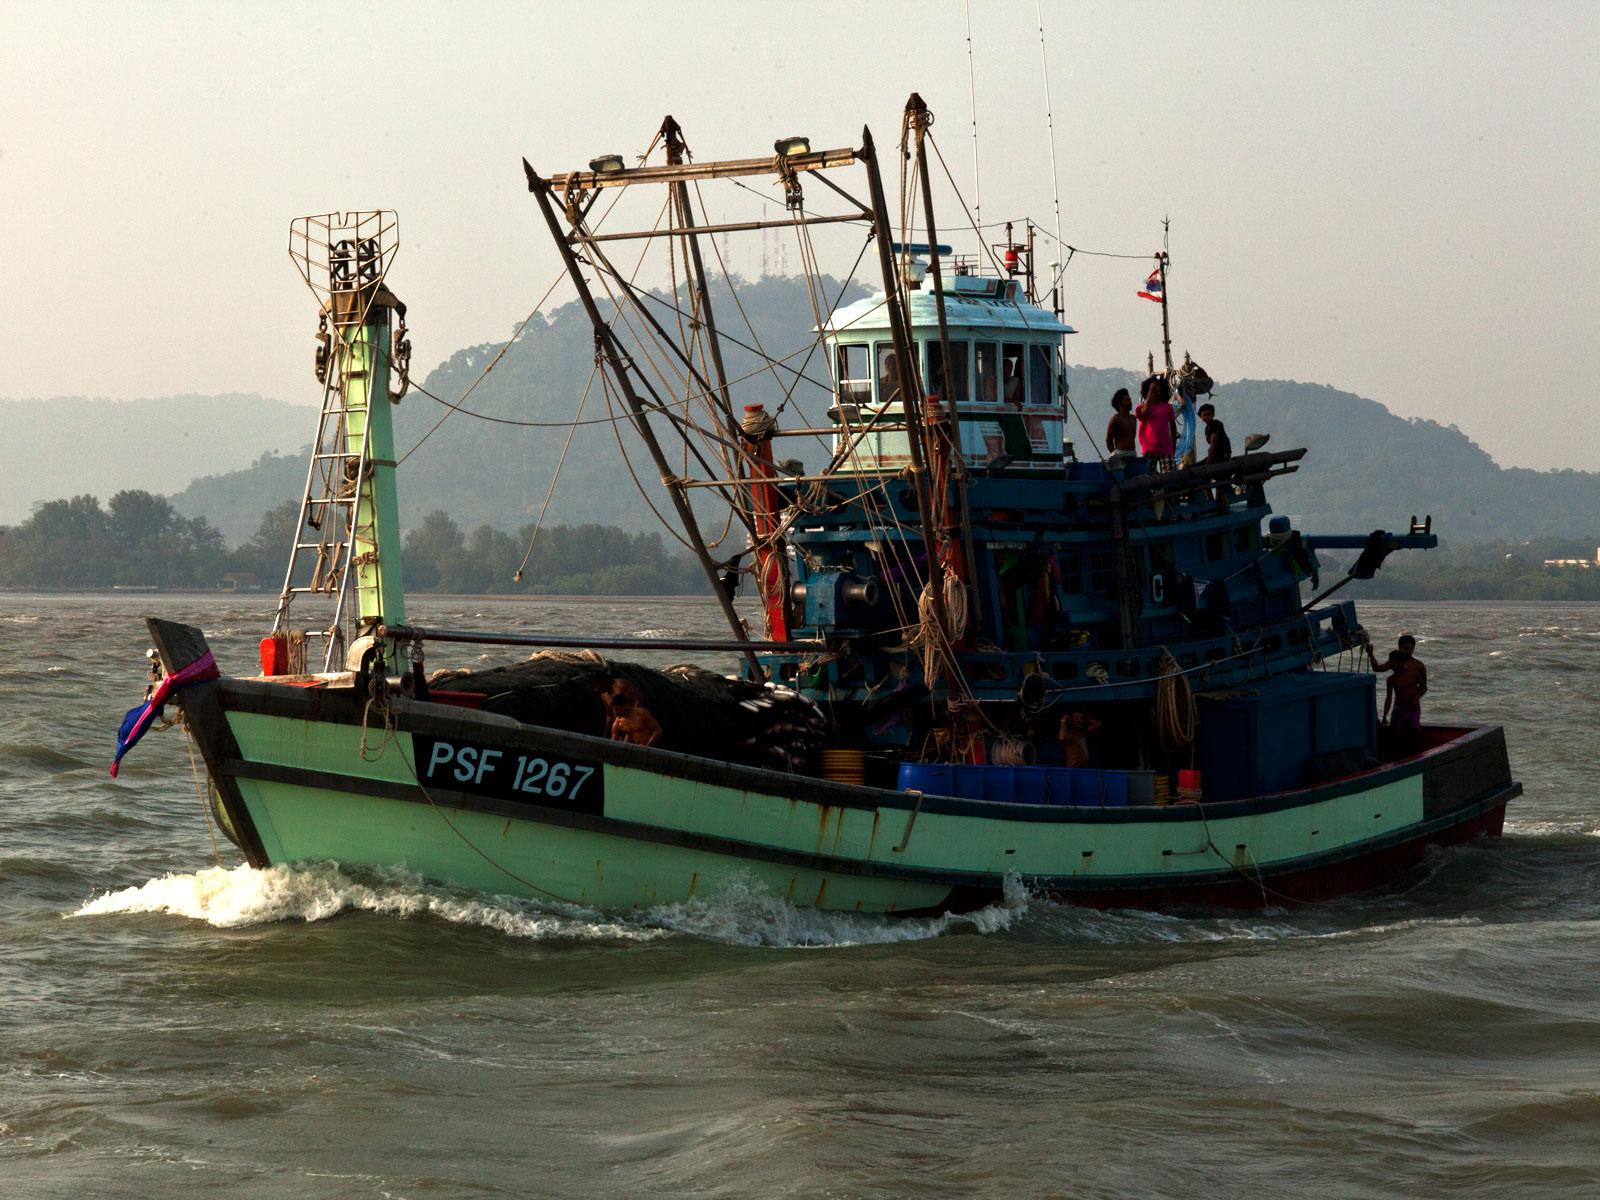 Thai fishing boat PSF 1267 Phuket Province Thailand 01